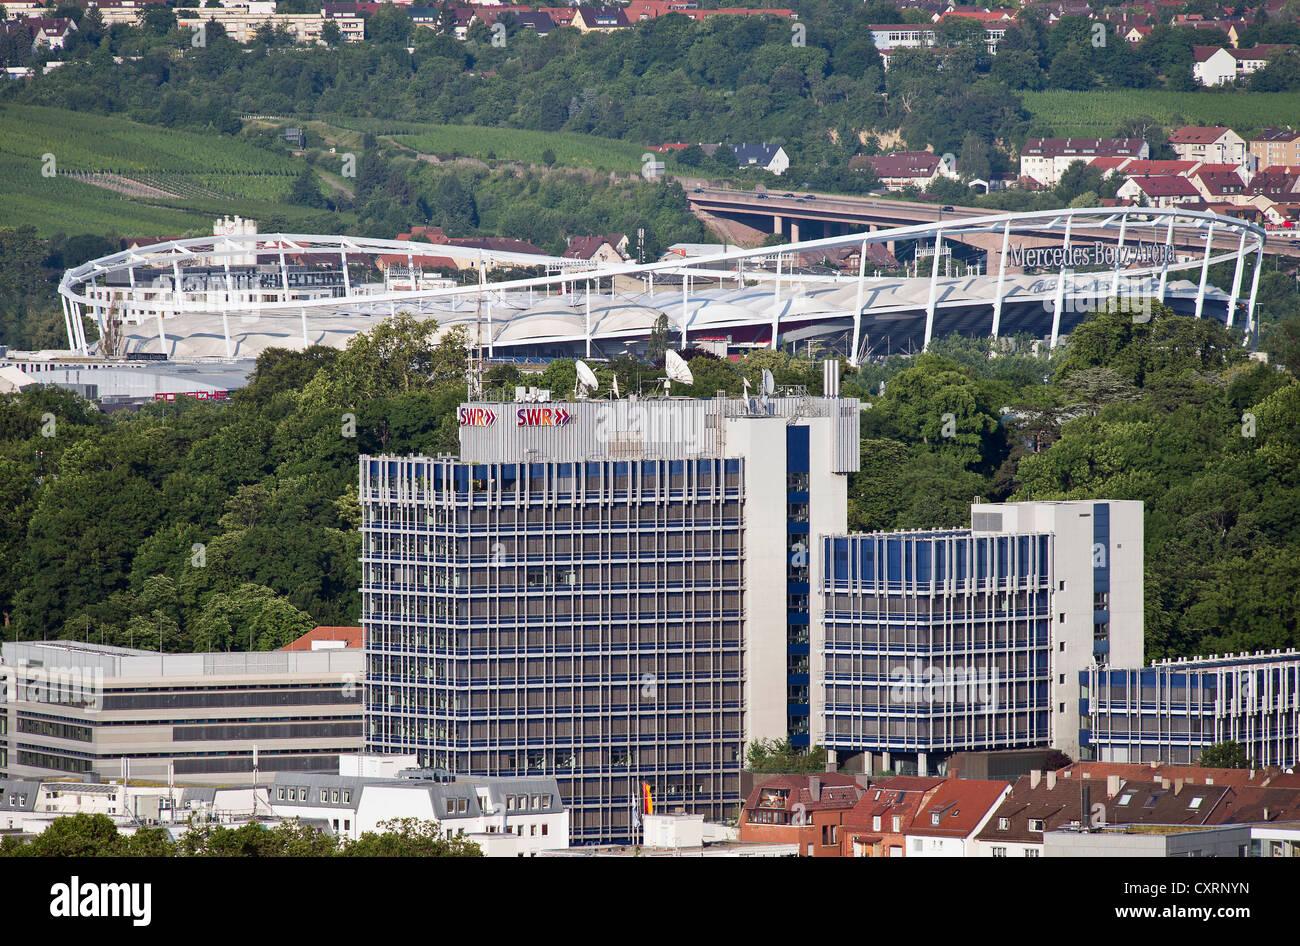 SWR building, television company, Mercedes-Benz Arena, stadium of VfB Stuttgart football club, Stuttgart, Baden - Stock Image